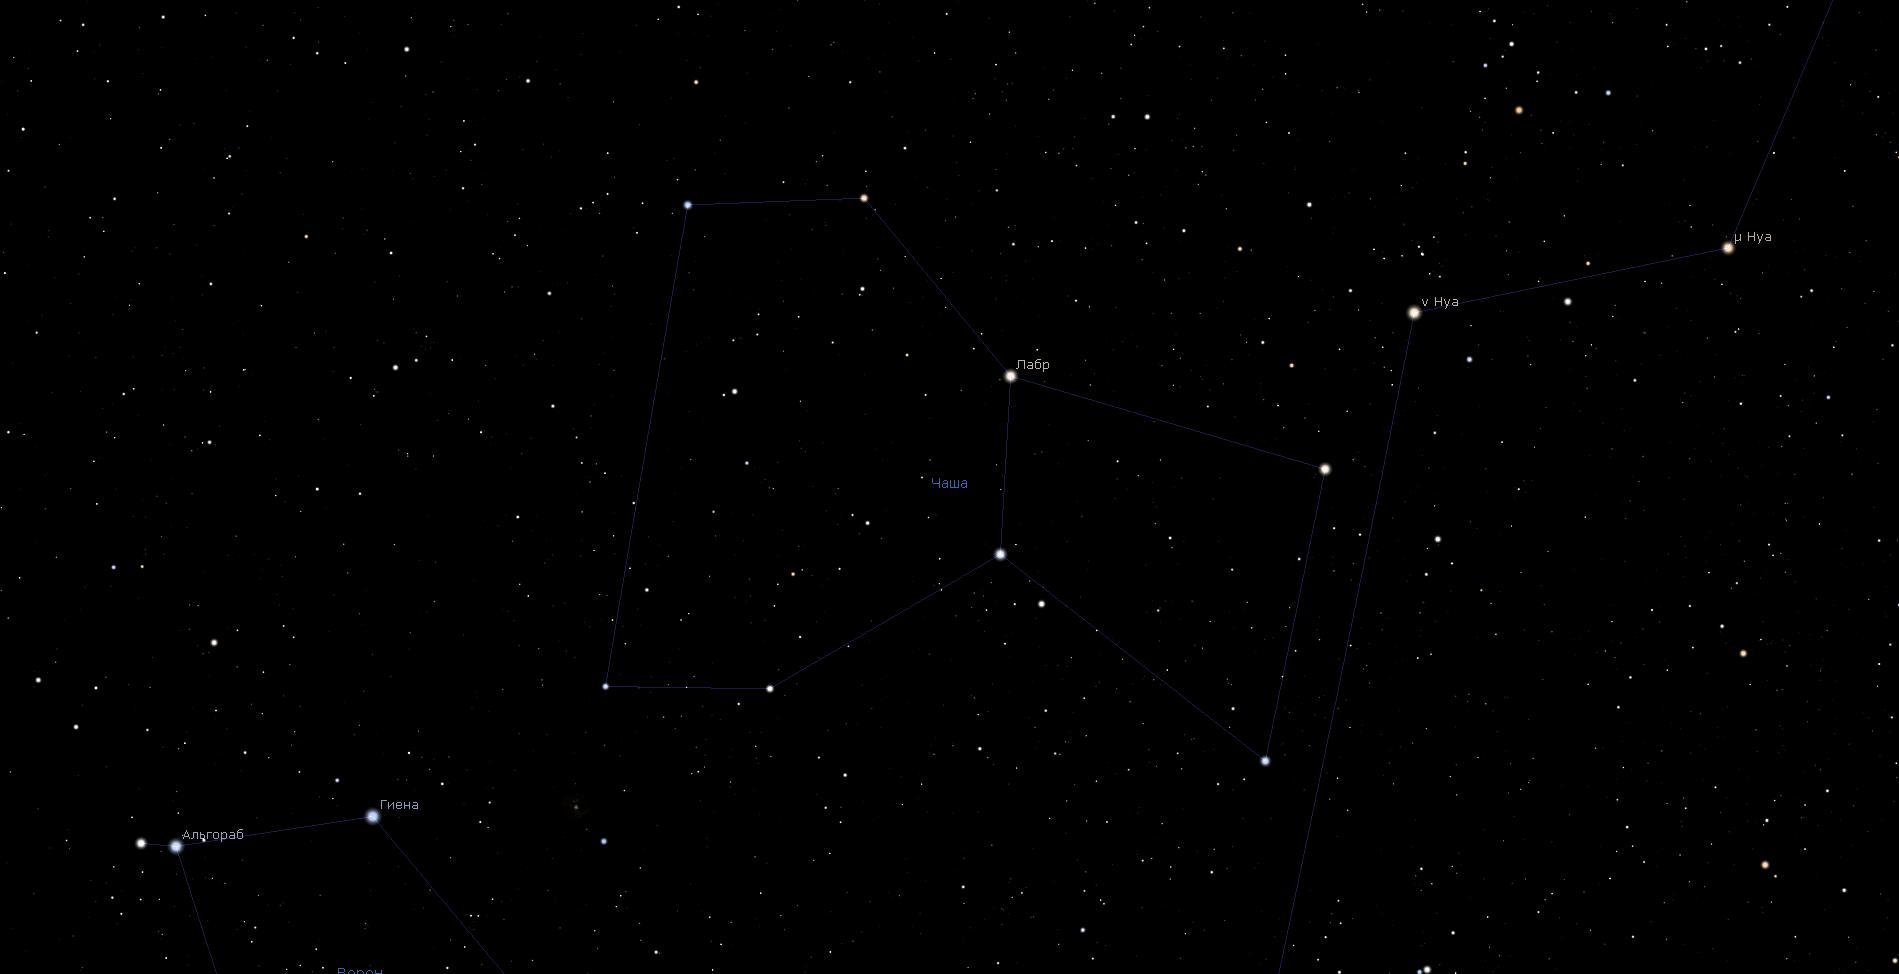 Созвездие Чаша, вид в программу планетарий Stellarium